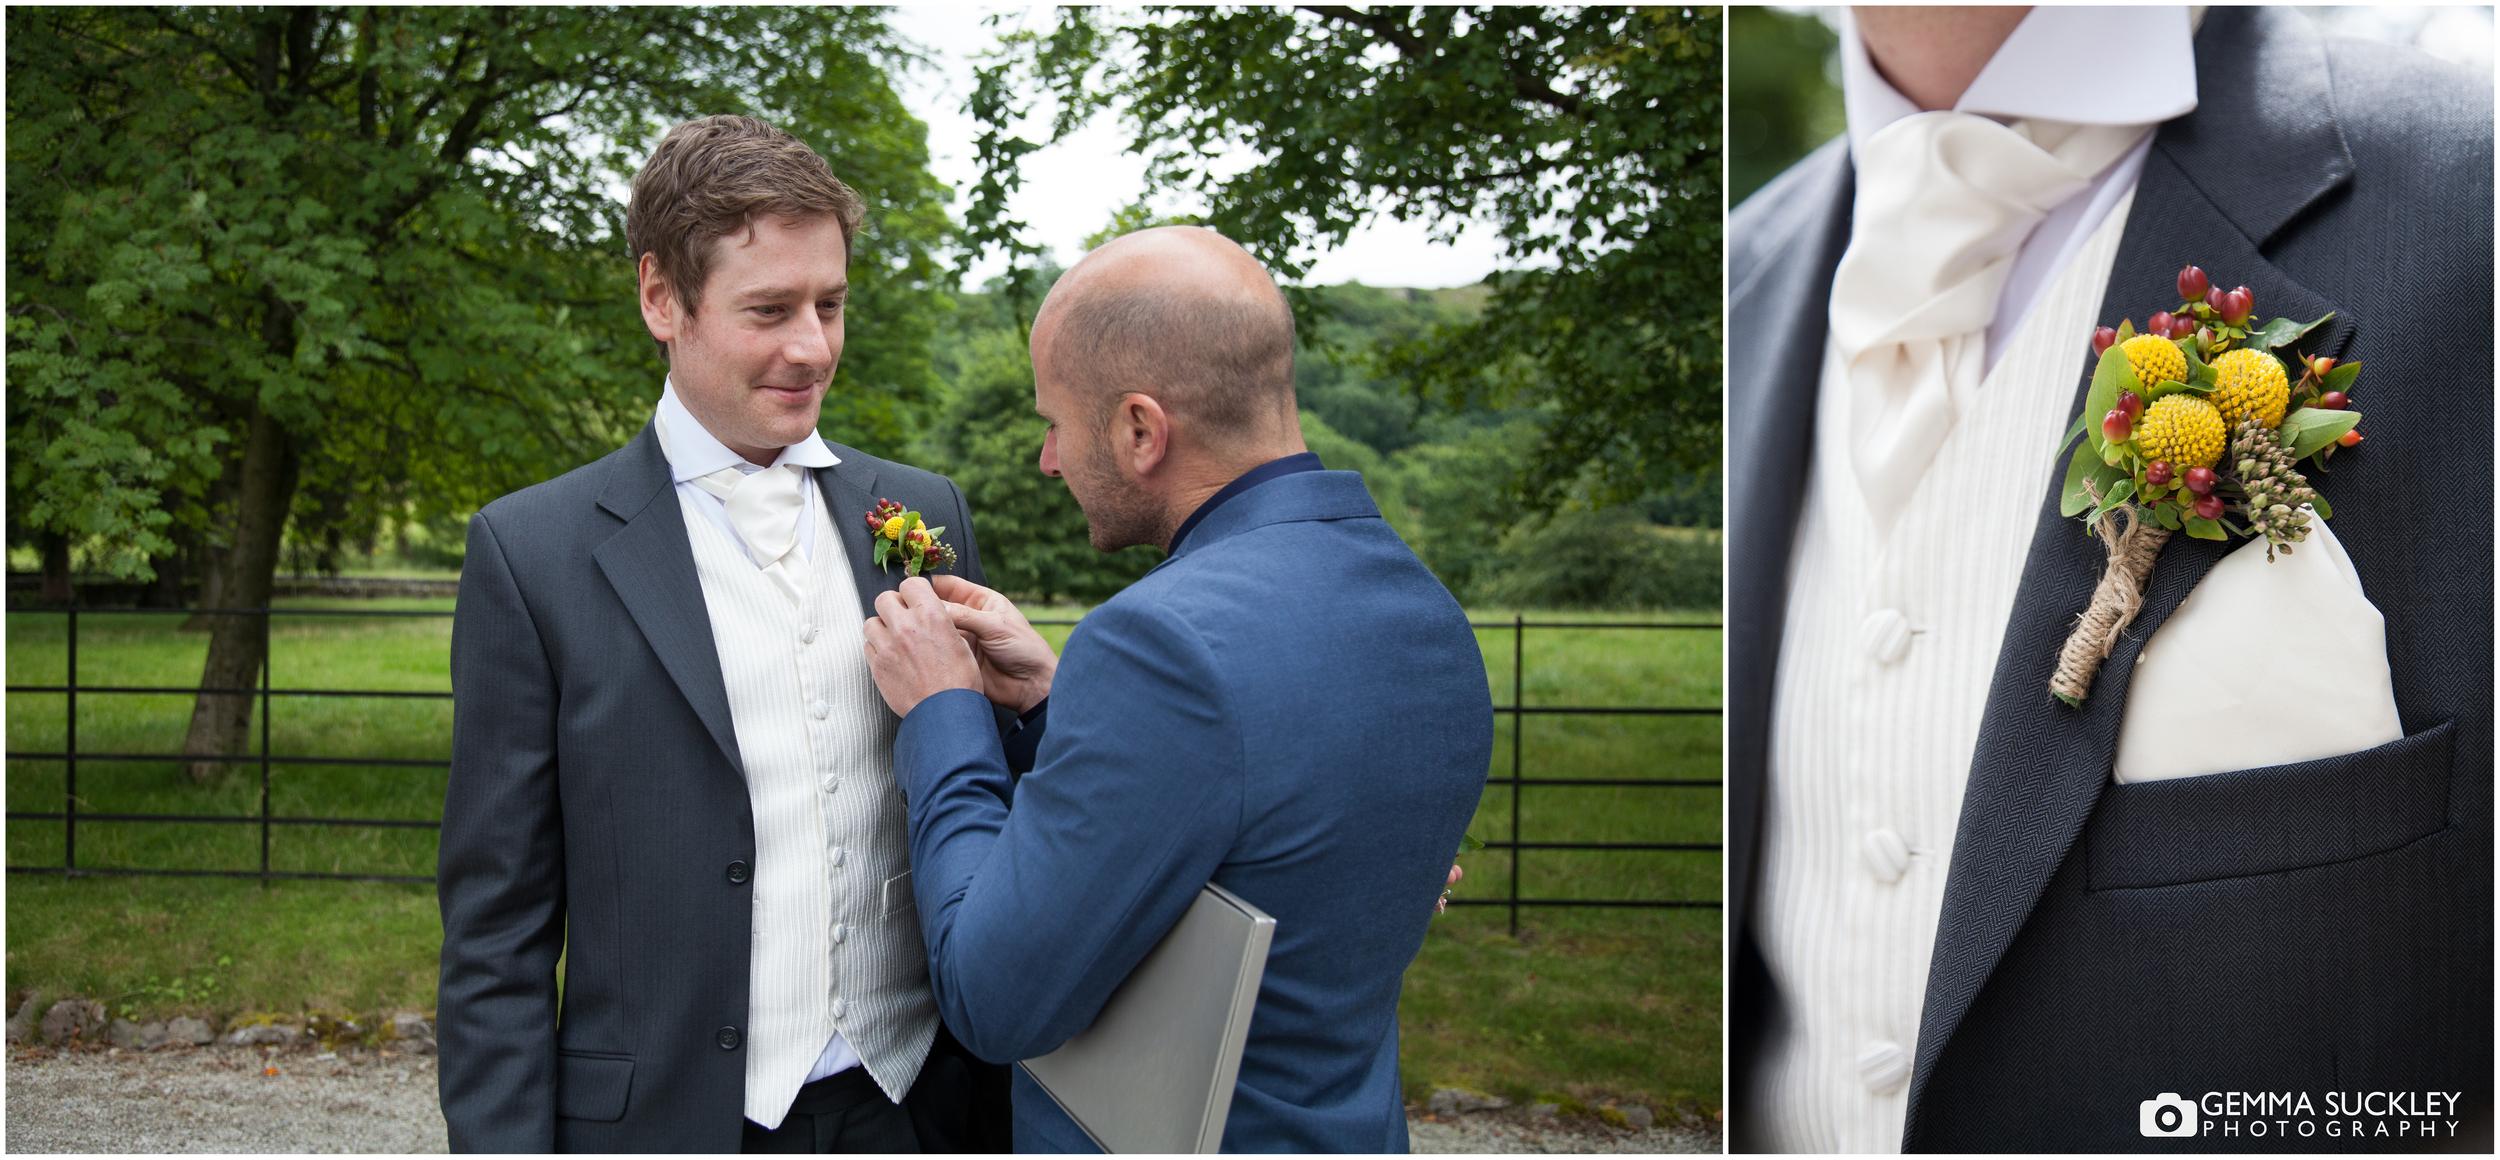 groom-detail-settle-weddings.jpg